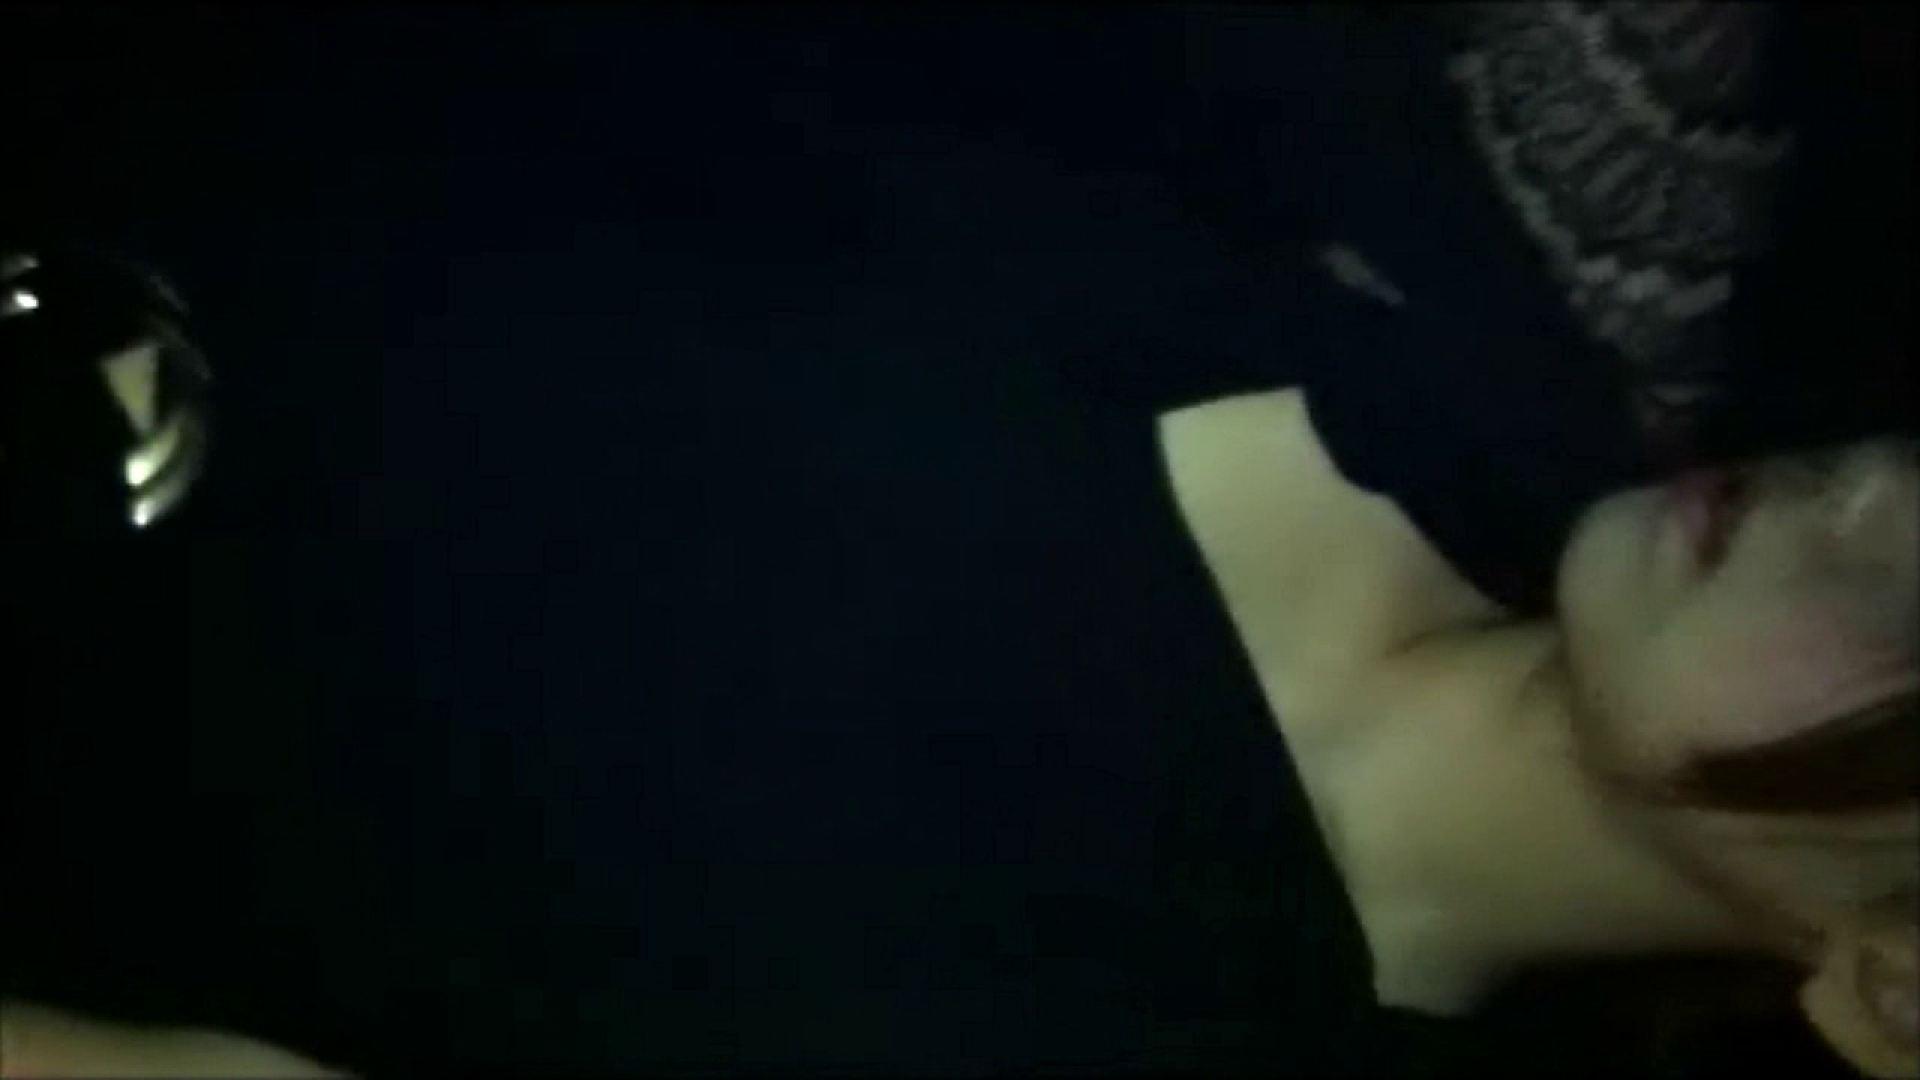 vol.5 【Nちゃん】某百貨店化粧品コーナー店員21歳 恋愛には至らず キャバ嬢達のヌード | 知人達のヌード  30連発